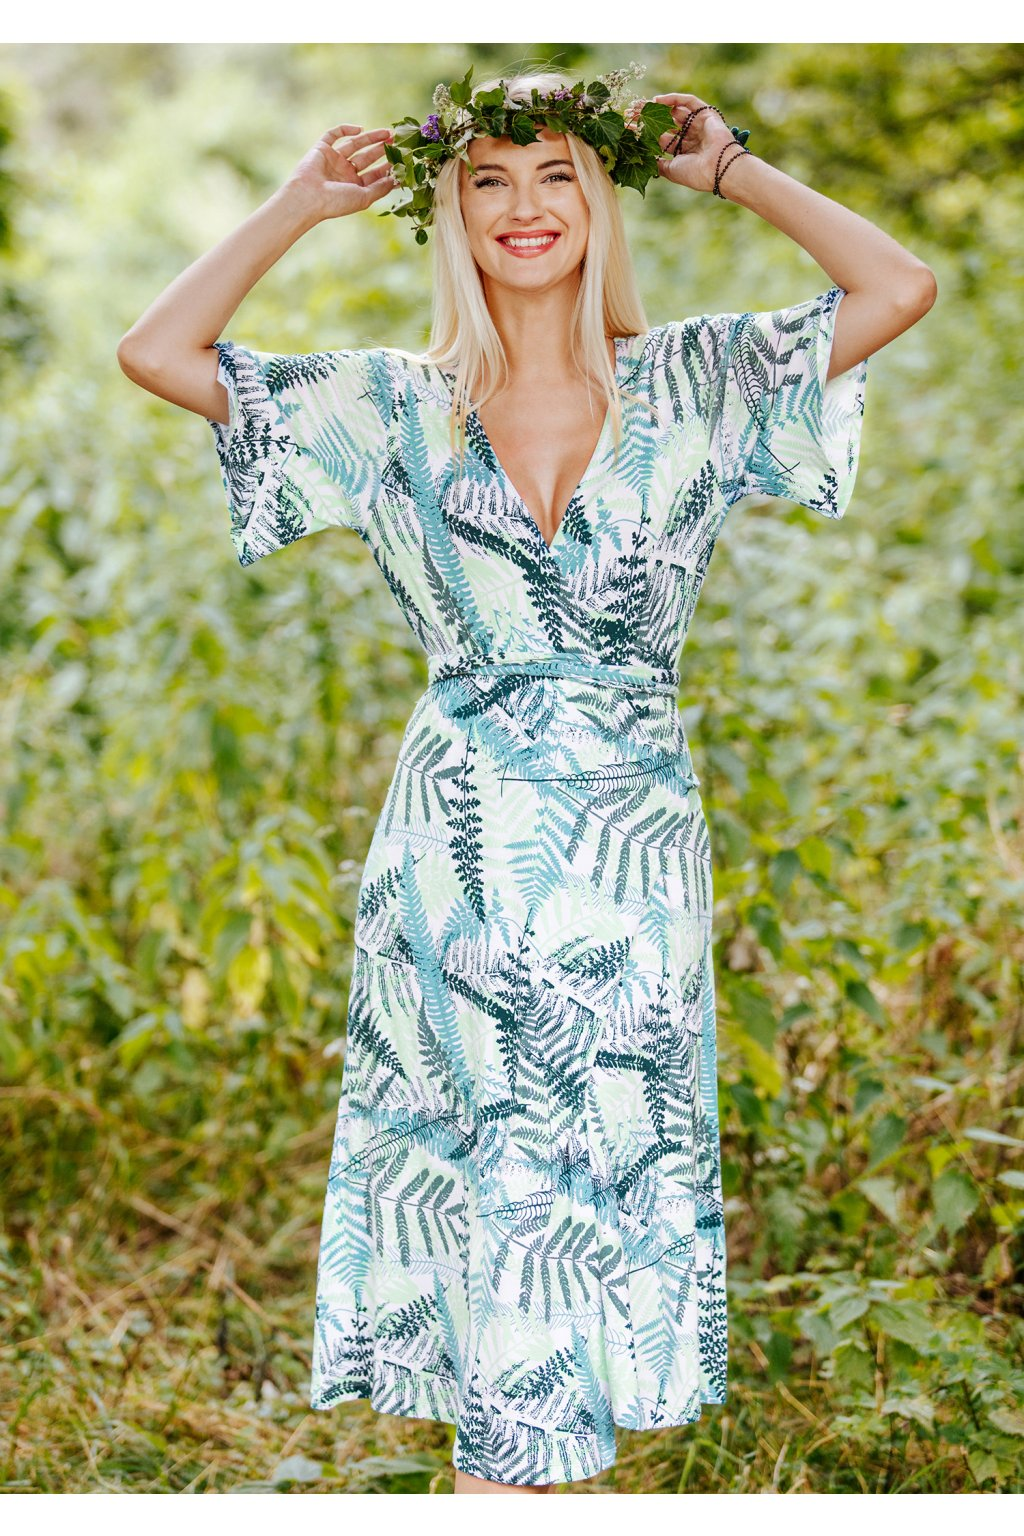 Oboustranné šaty - homewear Key LHD 907 A20